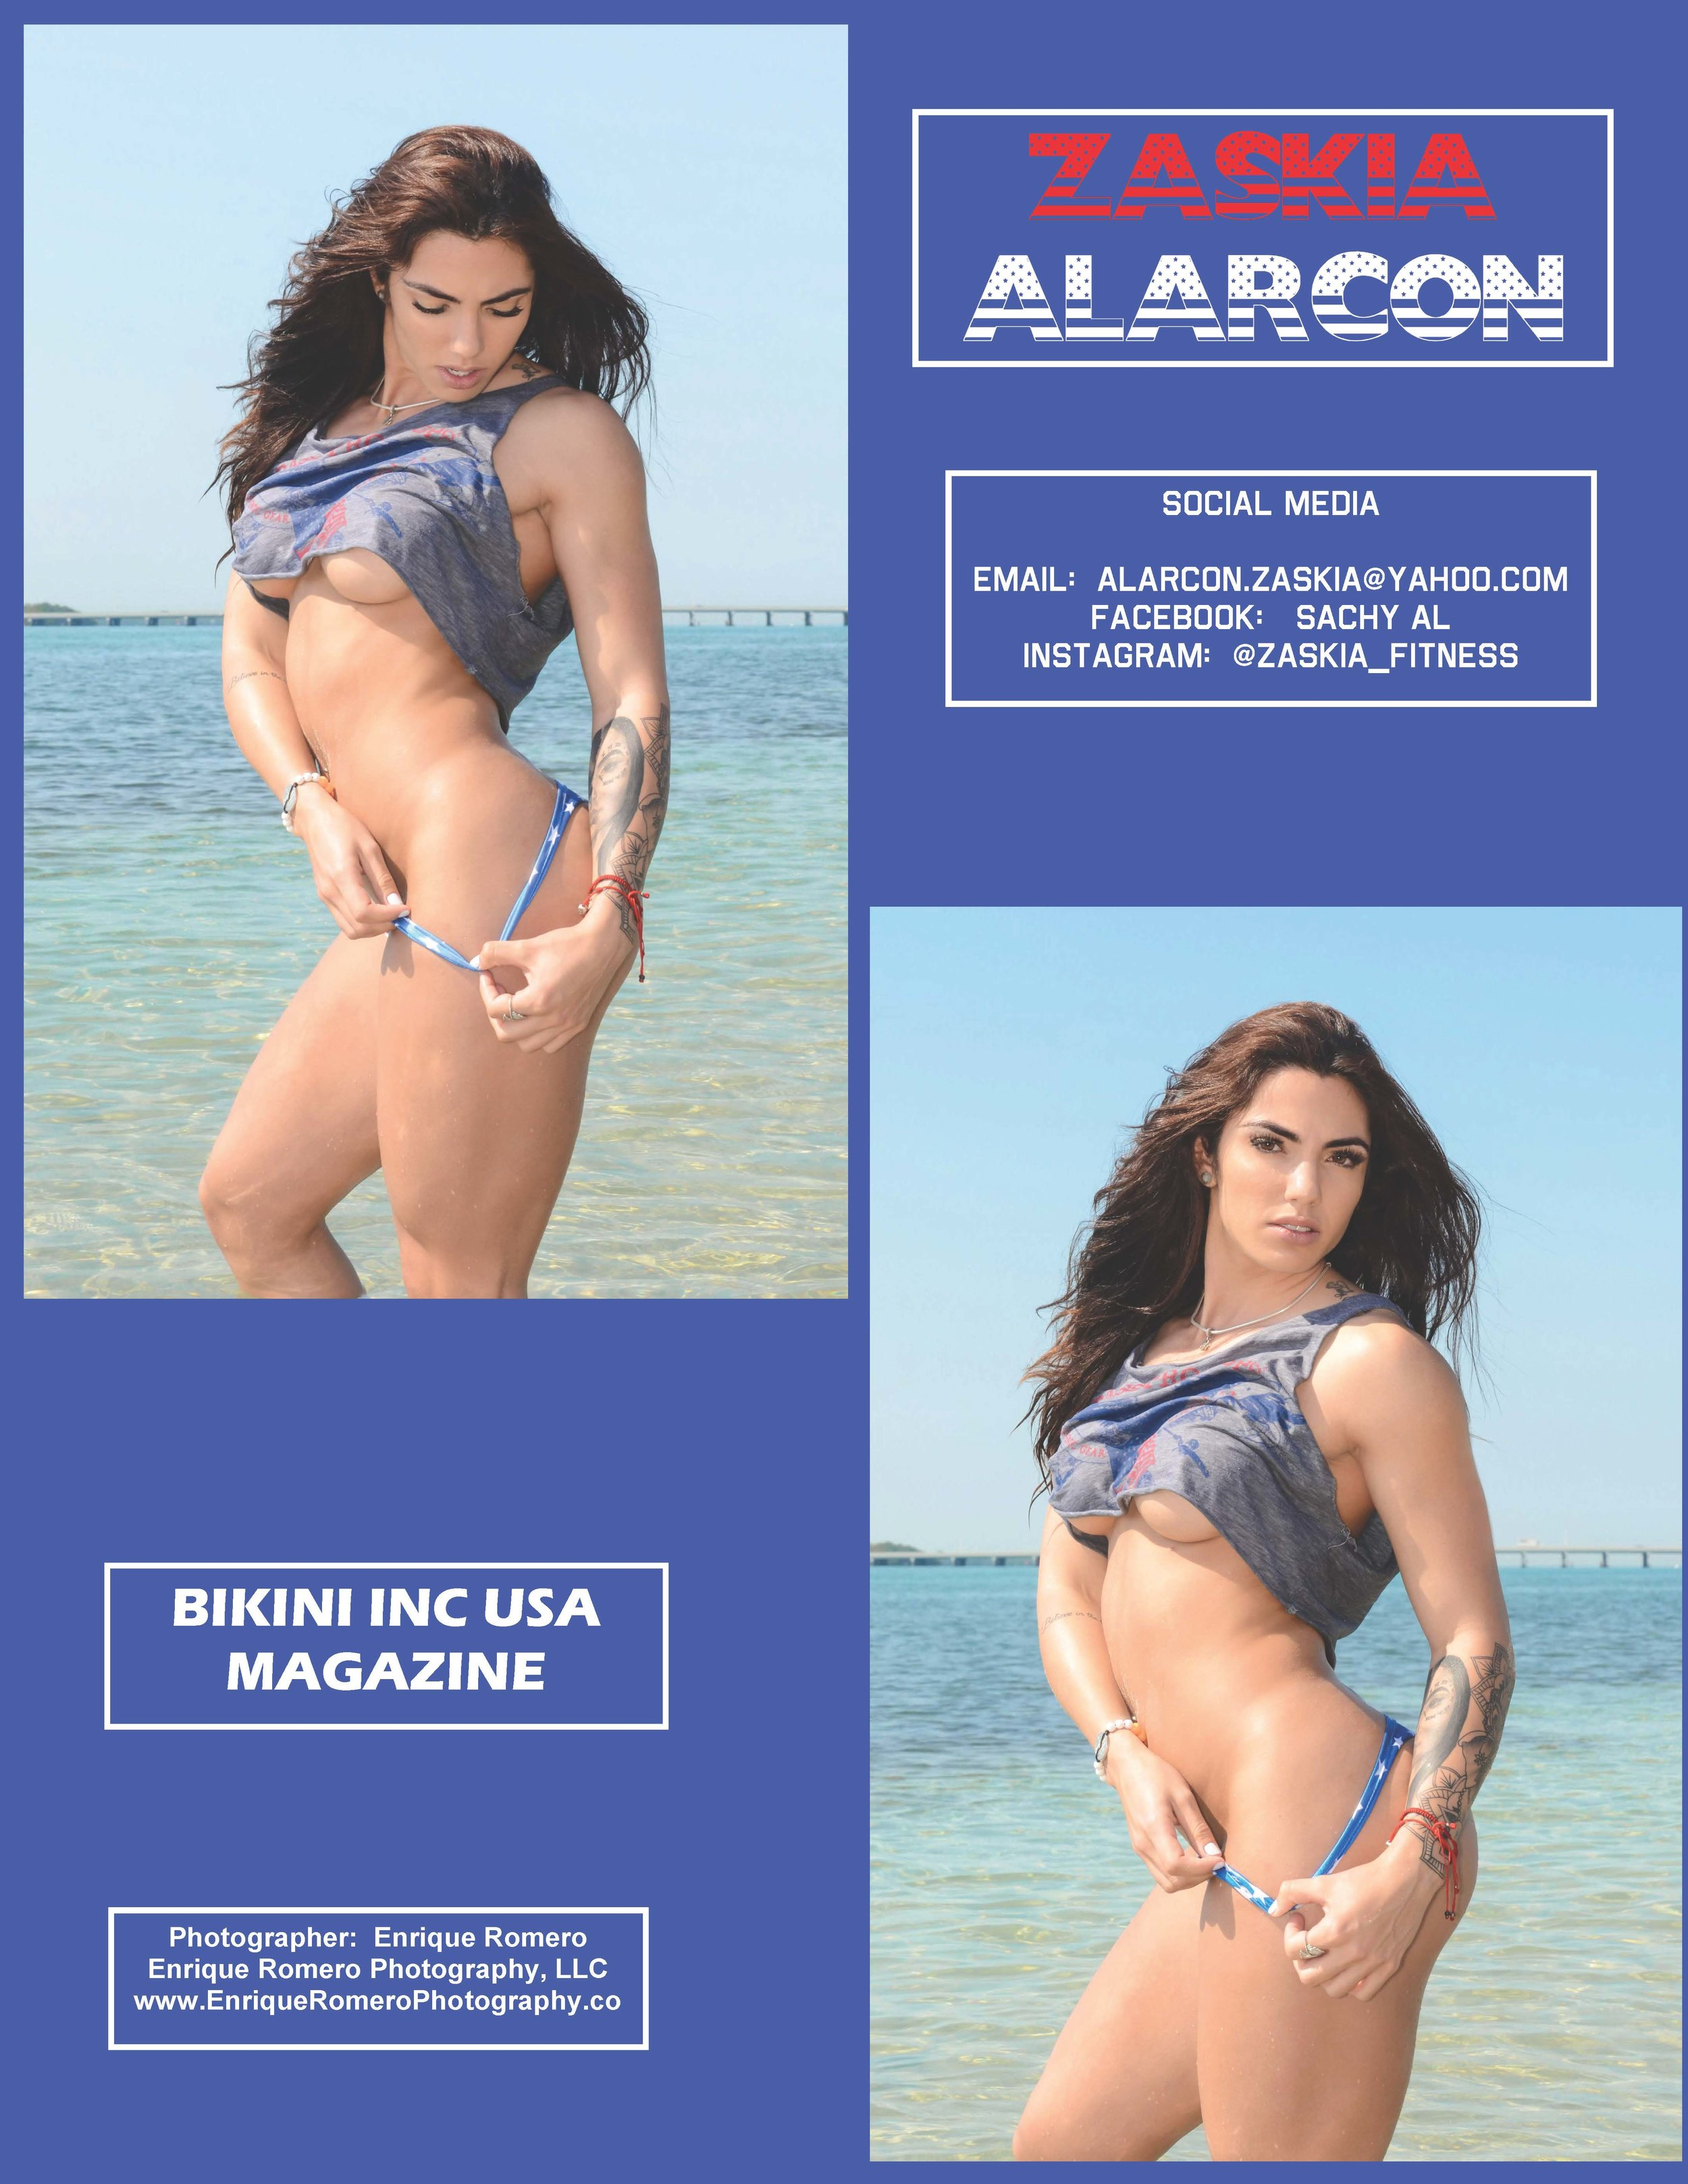 13-Bikini Inc USA Magazine - July 2017-ZA.jpg